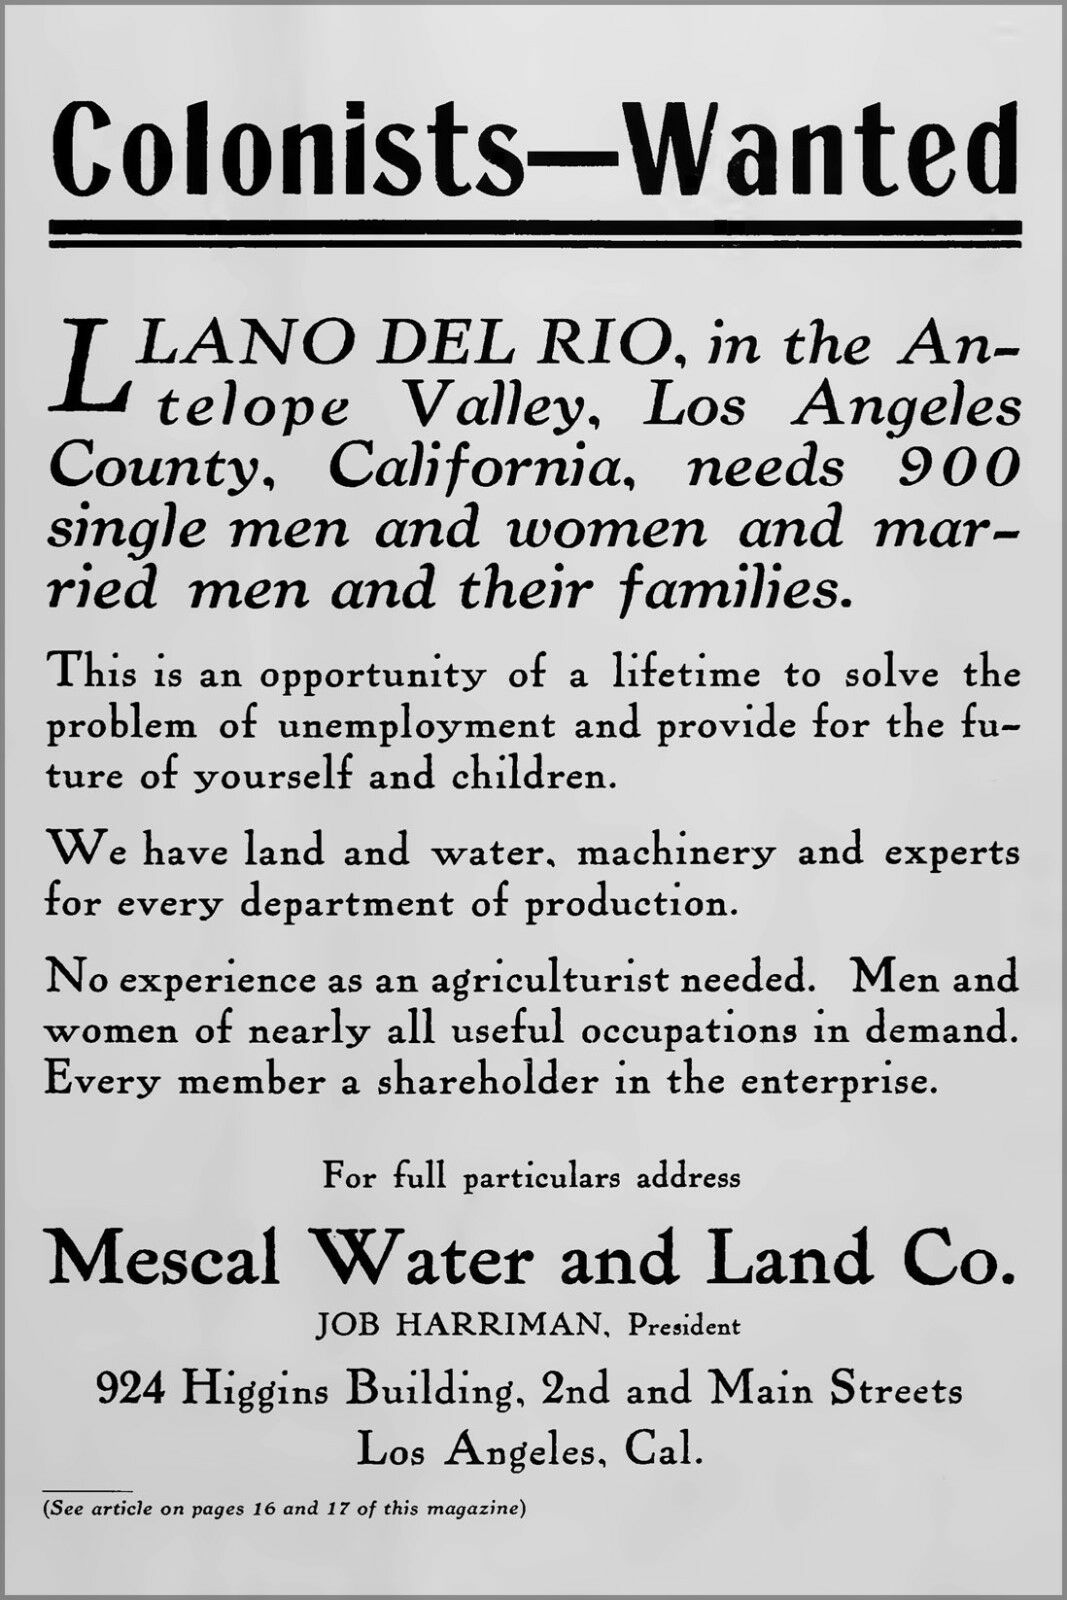 Poster, Many Dimensiones; Los Angeles California Ad For Llano Cooperative Colony 1914